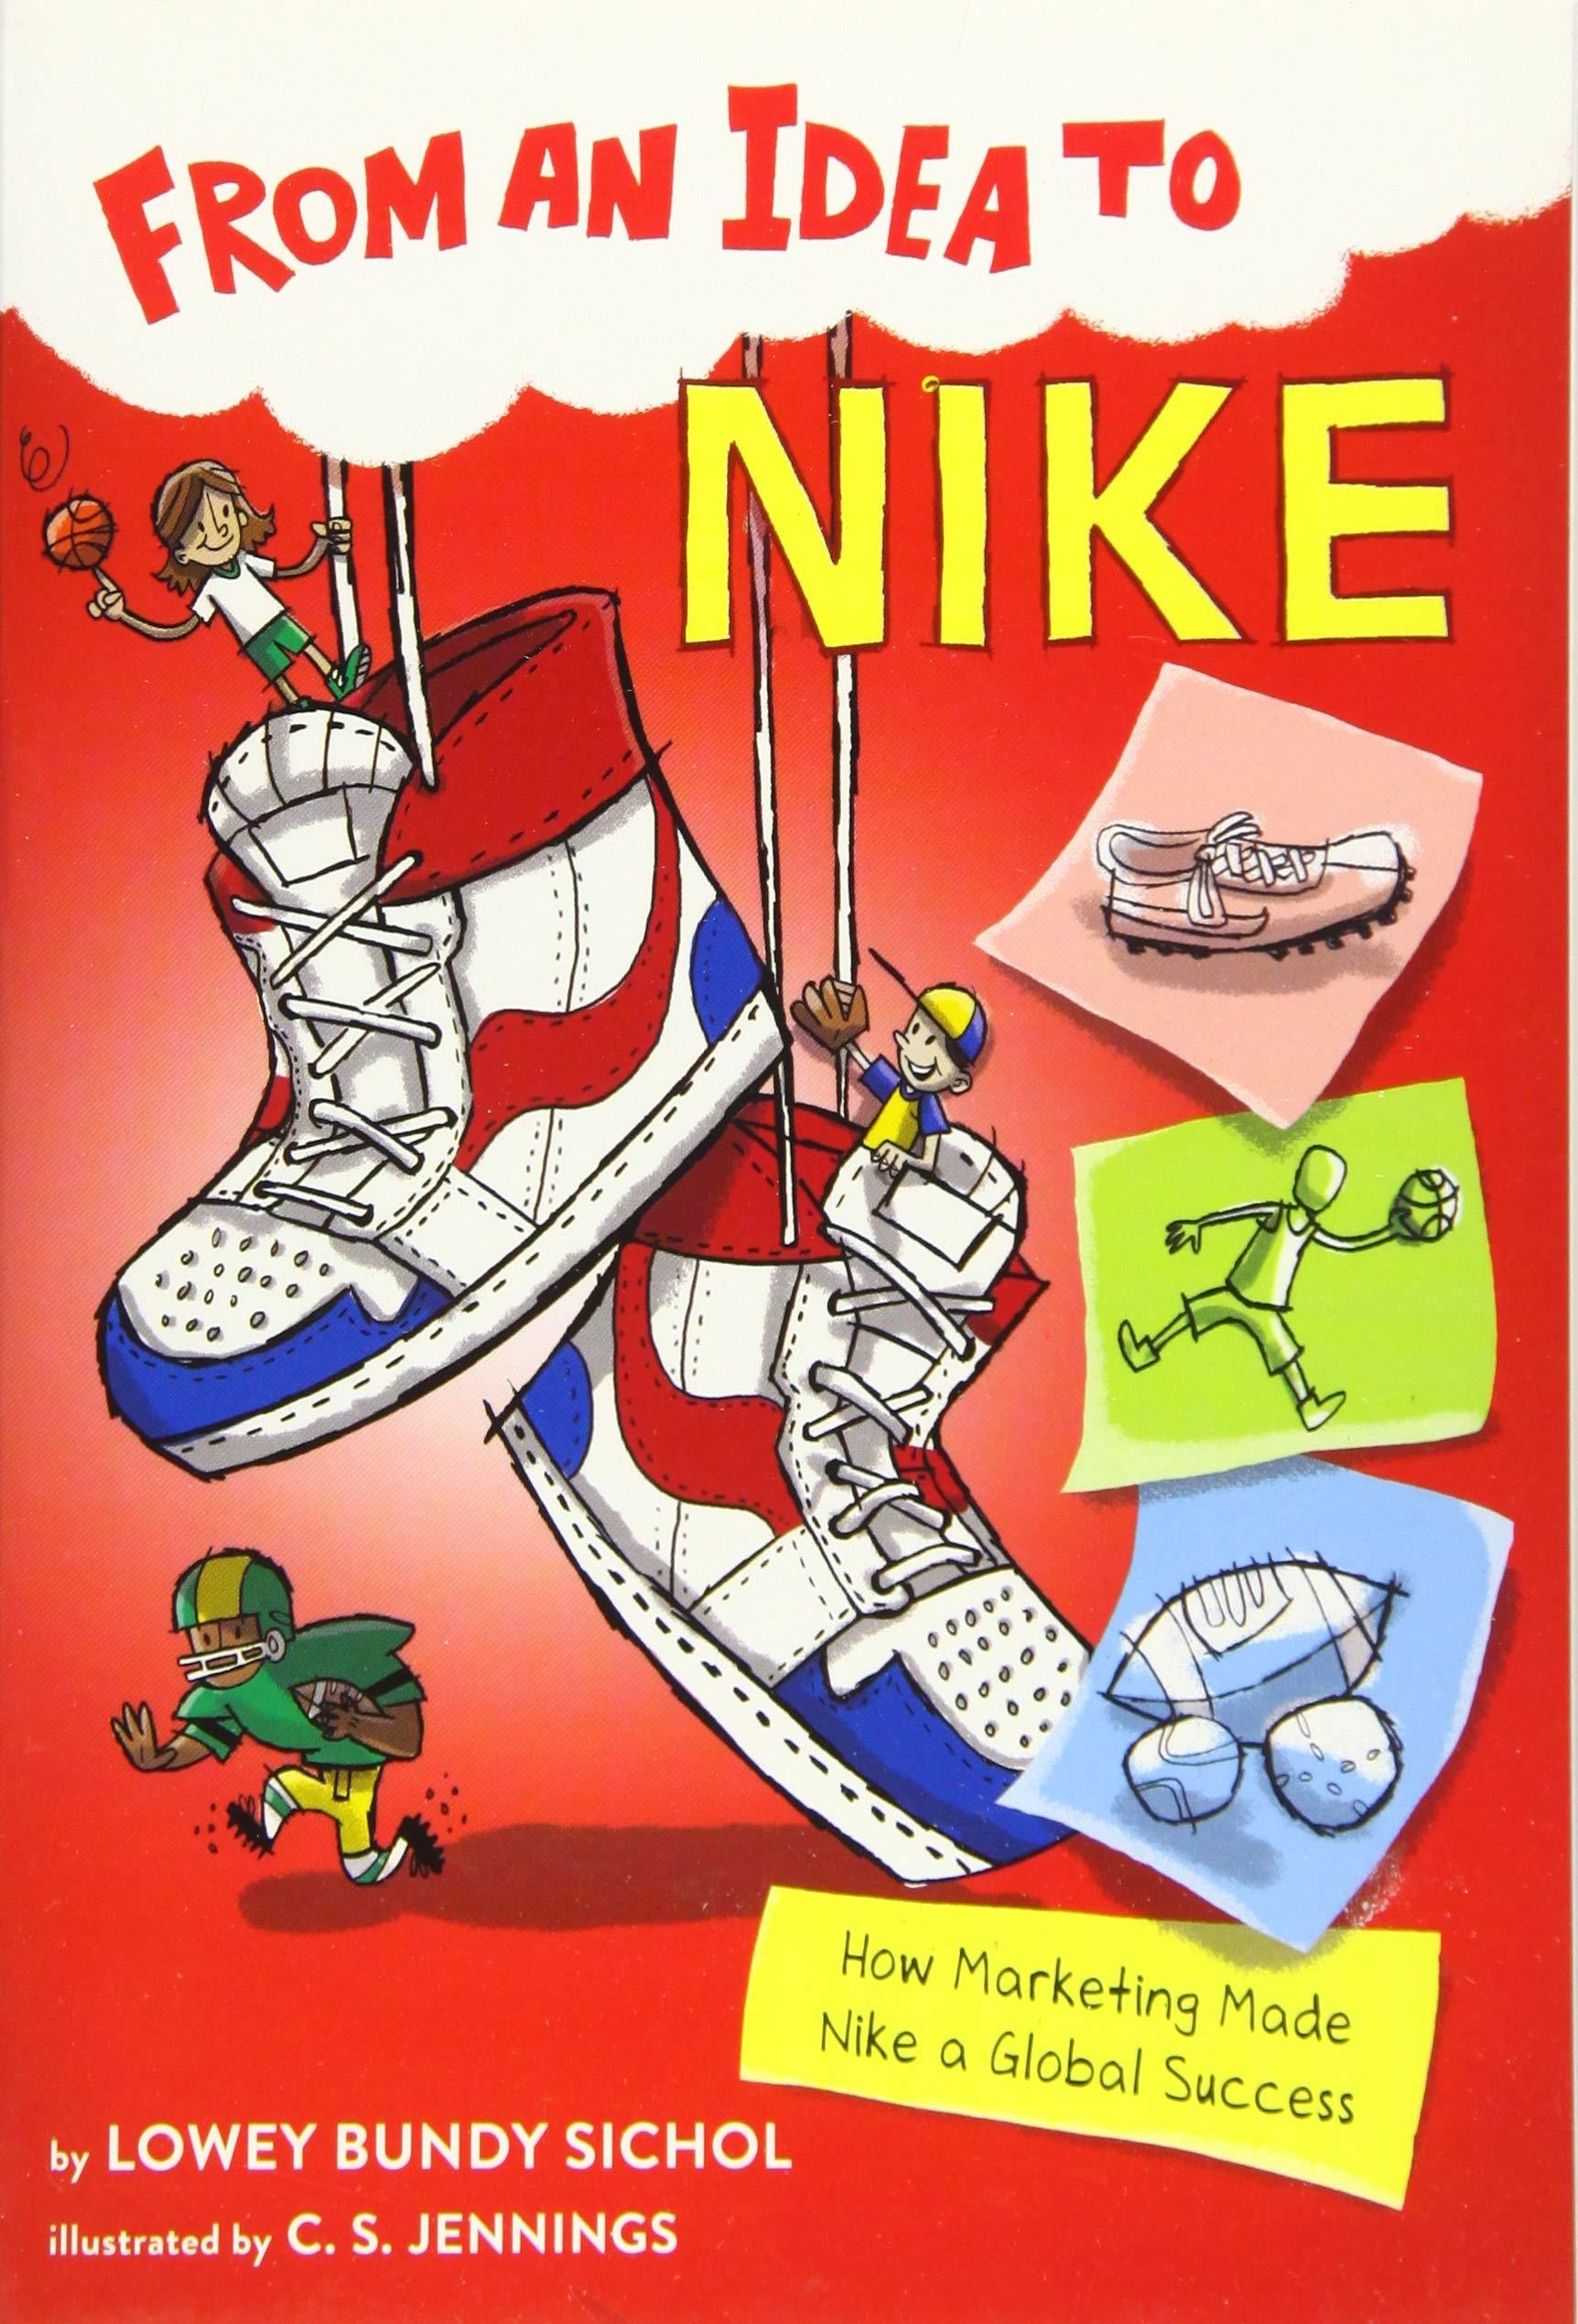 From an Idea to Nike: How Marketing Made Nike a Global Success: Sichol, Lowey Bundy, Jennings, C.S.: 9781328453631: Amazon.com: Books